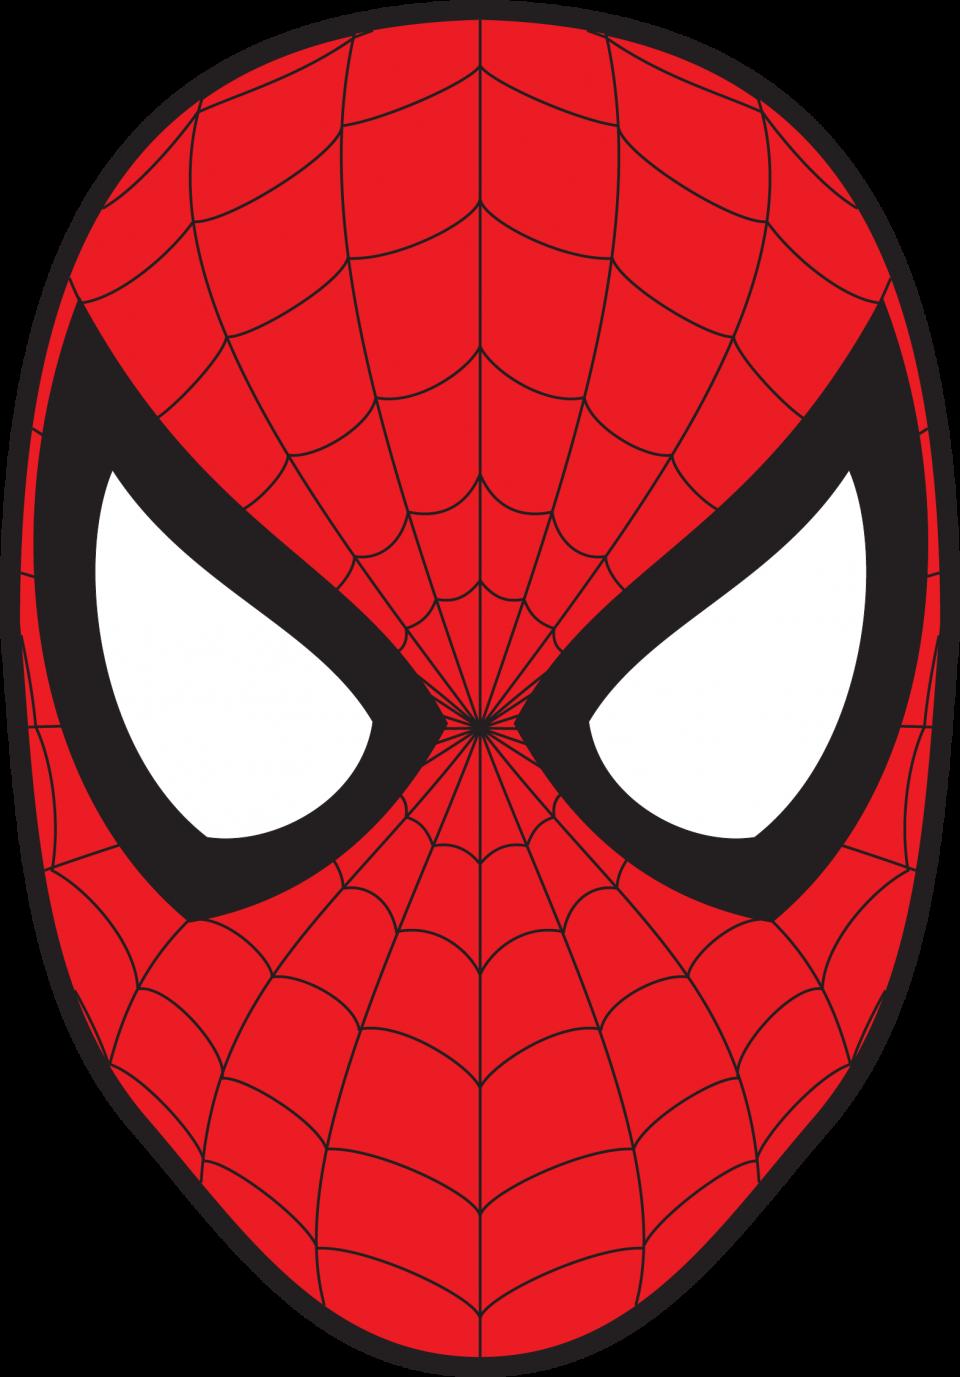 Spidey Mask PNG Image